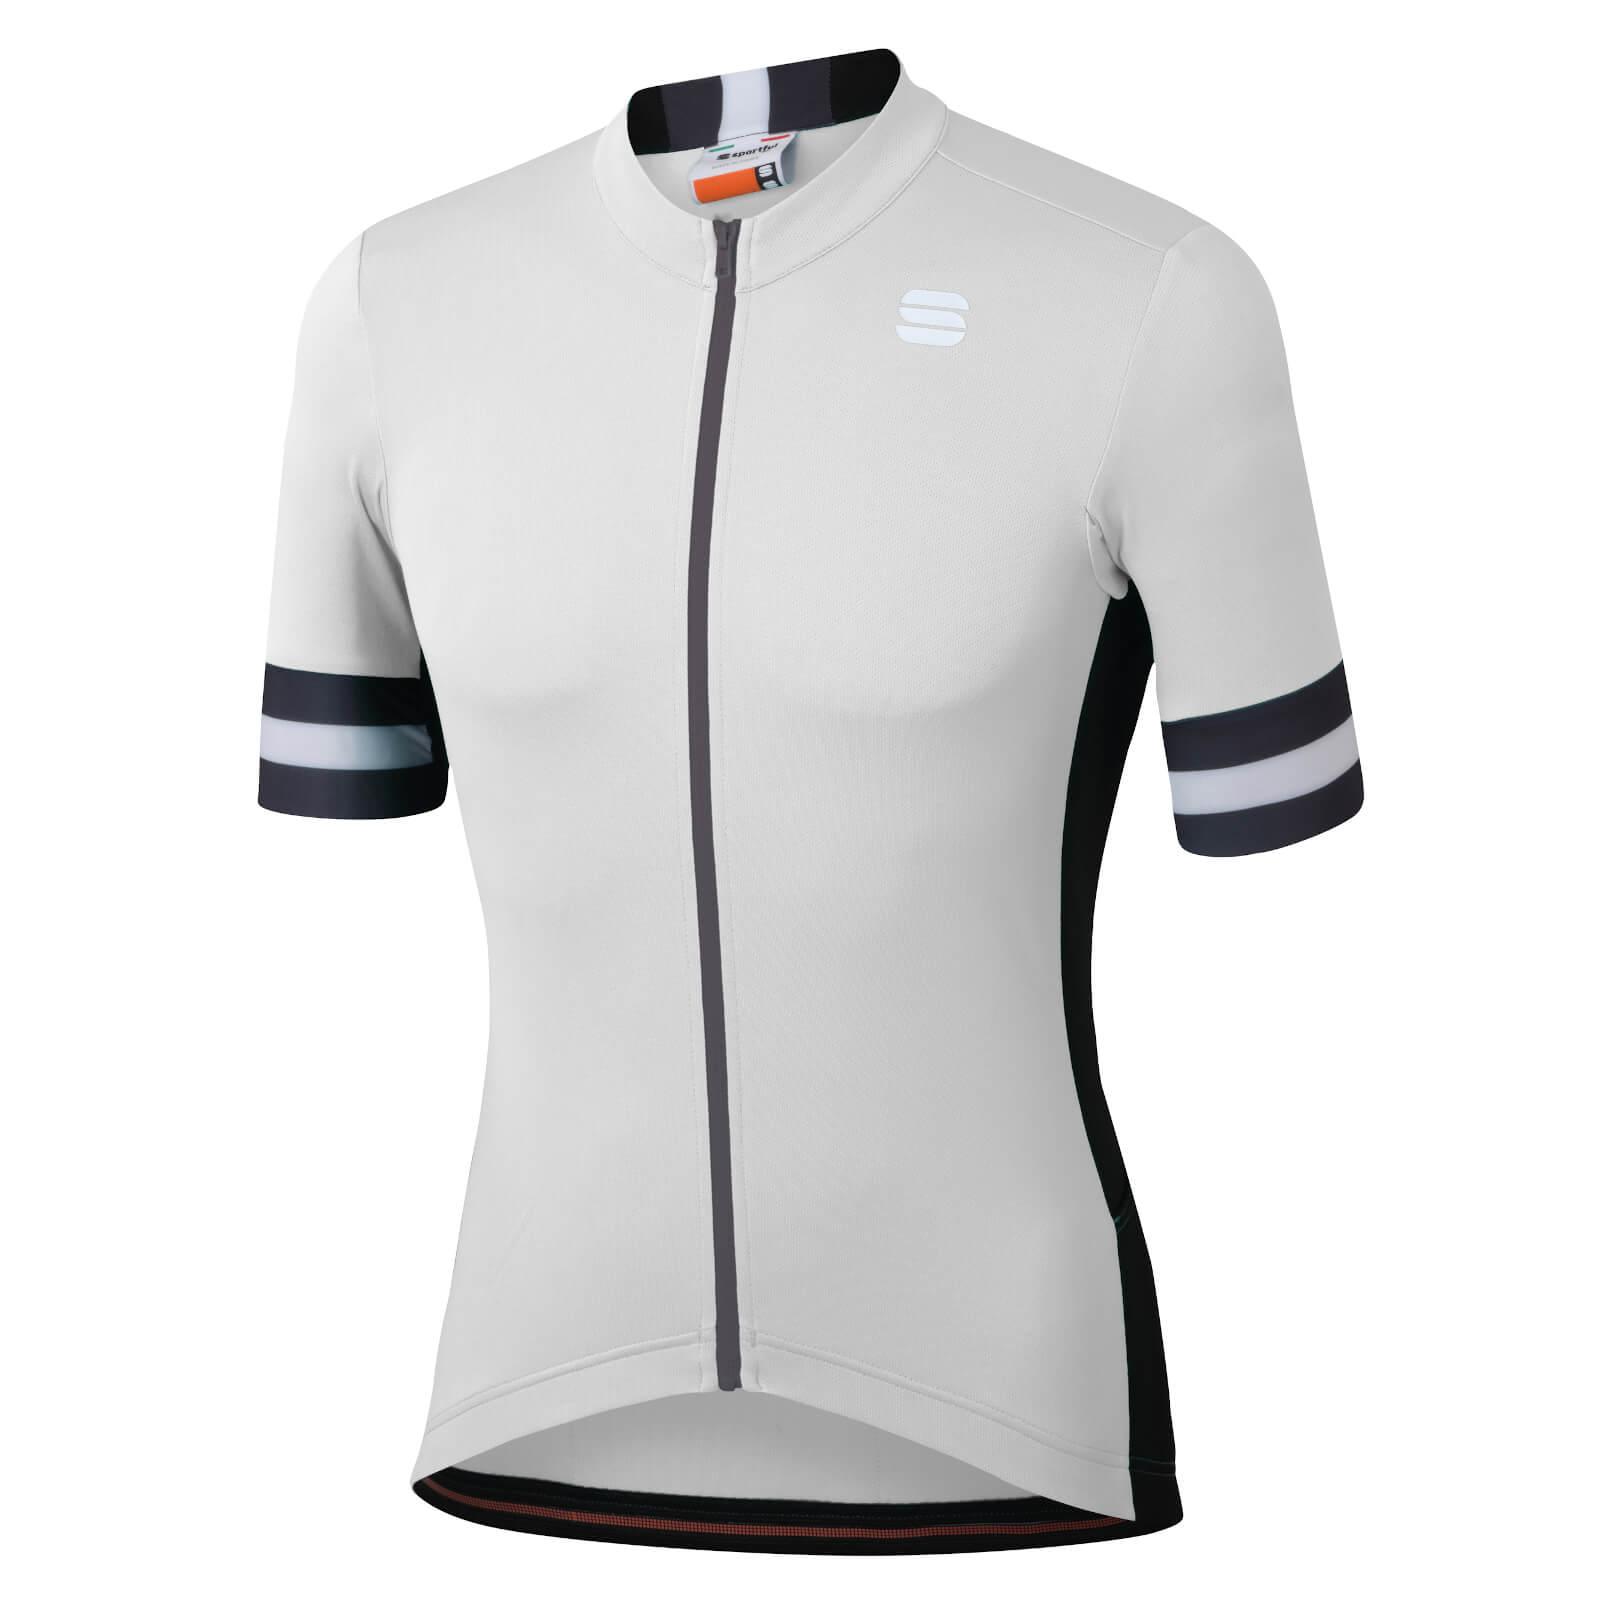 Sportful Kite Jersey - XL - White